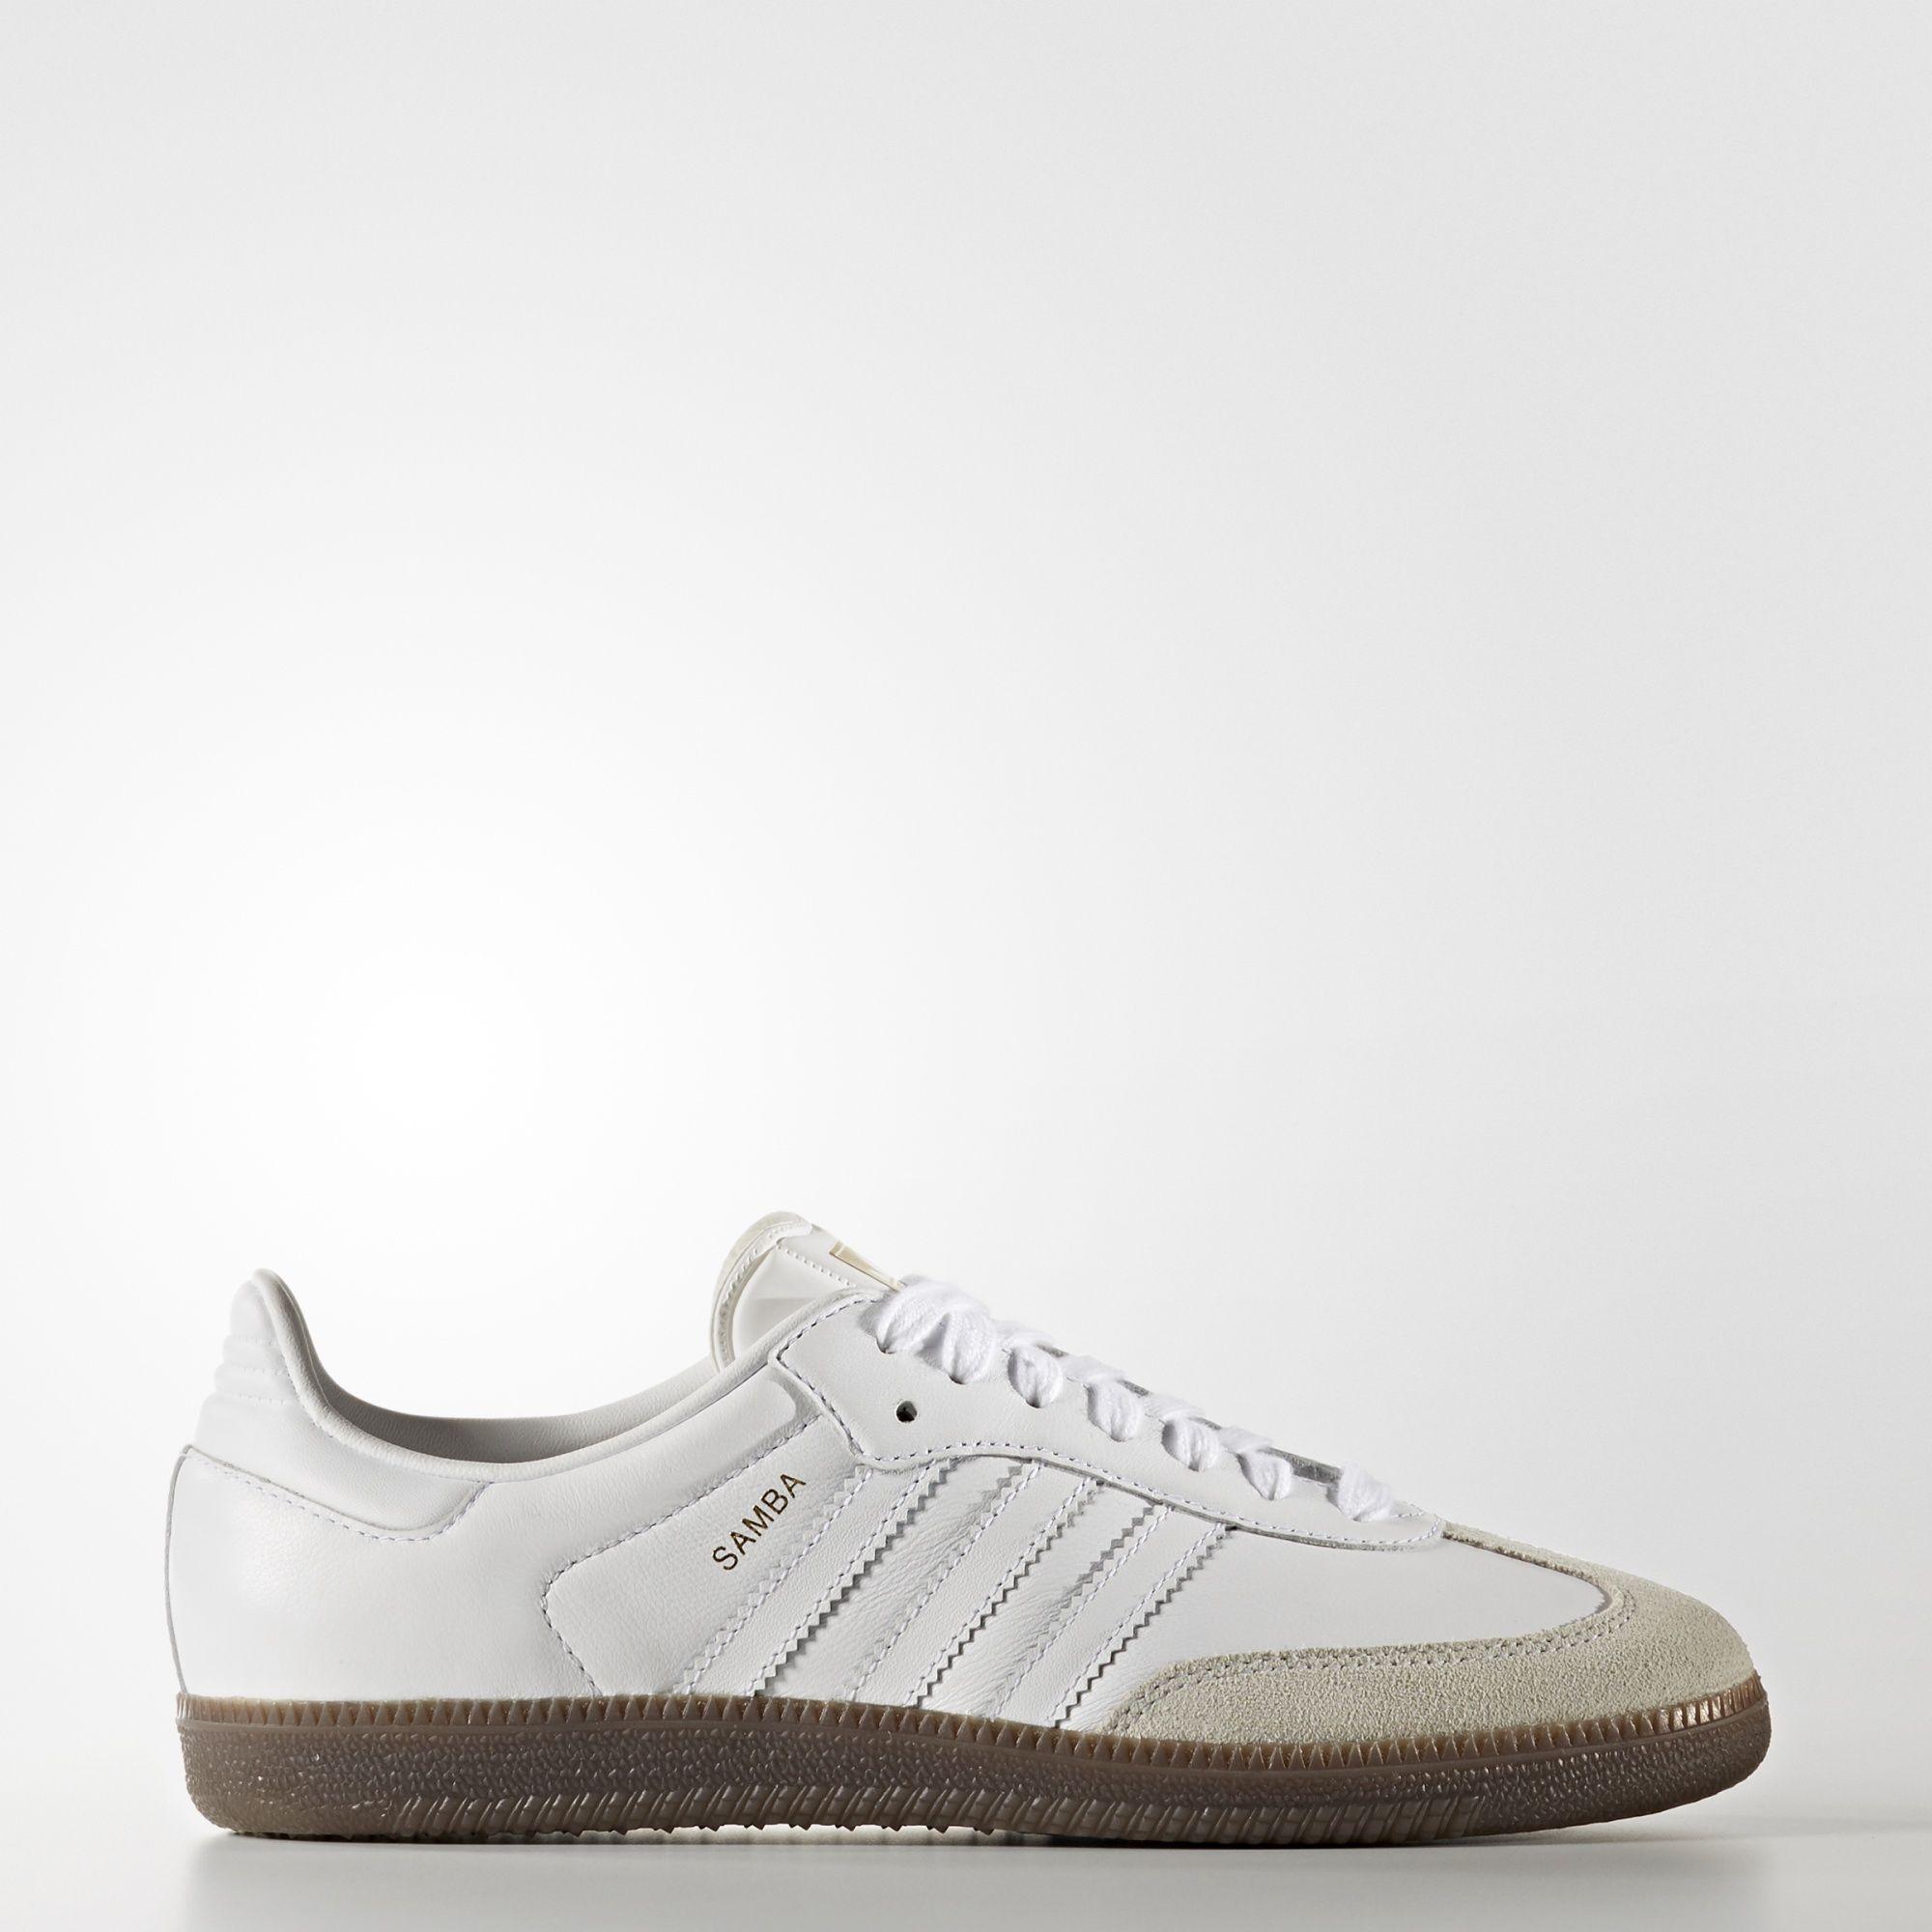 adidas Samba Schuhe | Offizieller adidas Shop. Samba ShoesThe SambaWhite ...